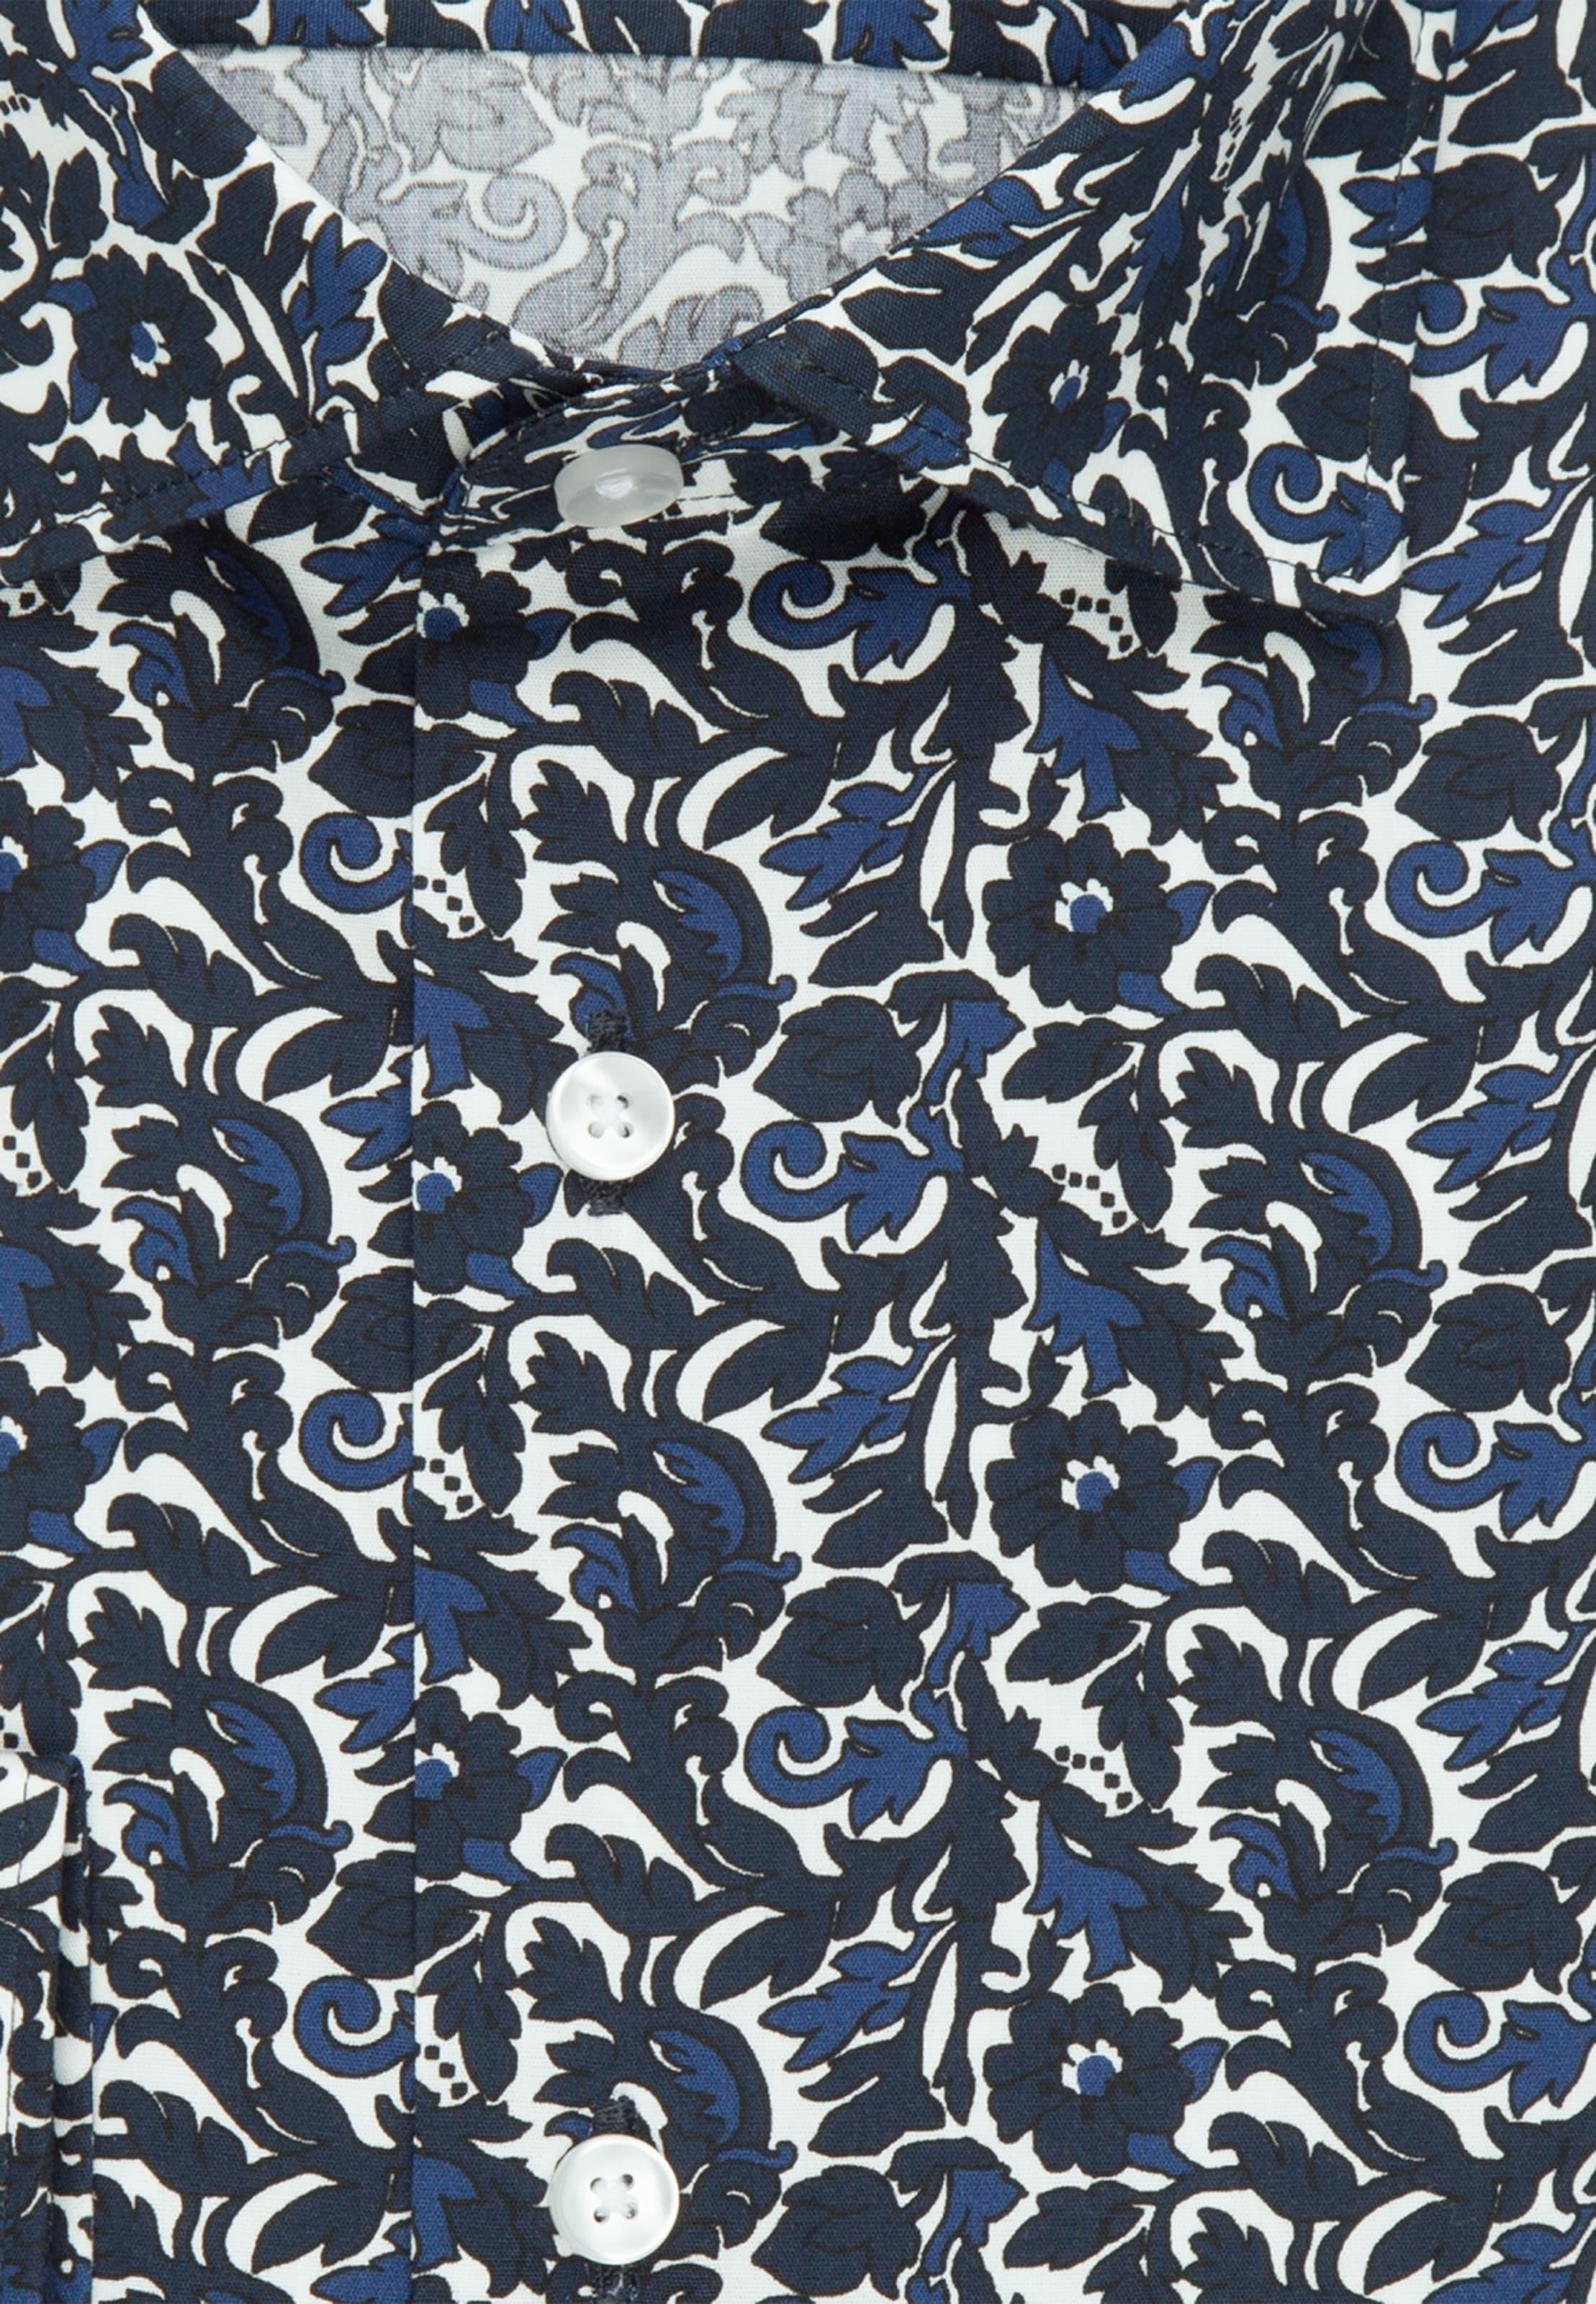 In BlauDunkelblau Hemd BlauDunkelblau Weiß Seidensticker Seidensticker Seidensticker Weiß Hemd Hemd In In BlauDunkelblau rCdBxoe